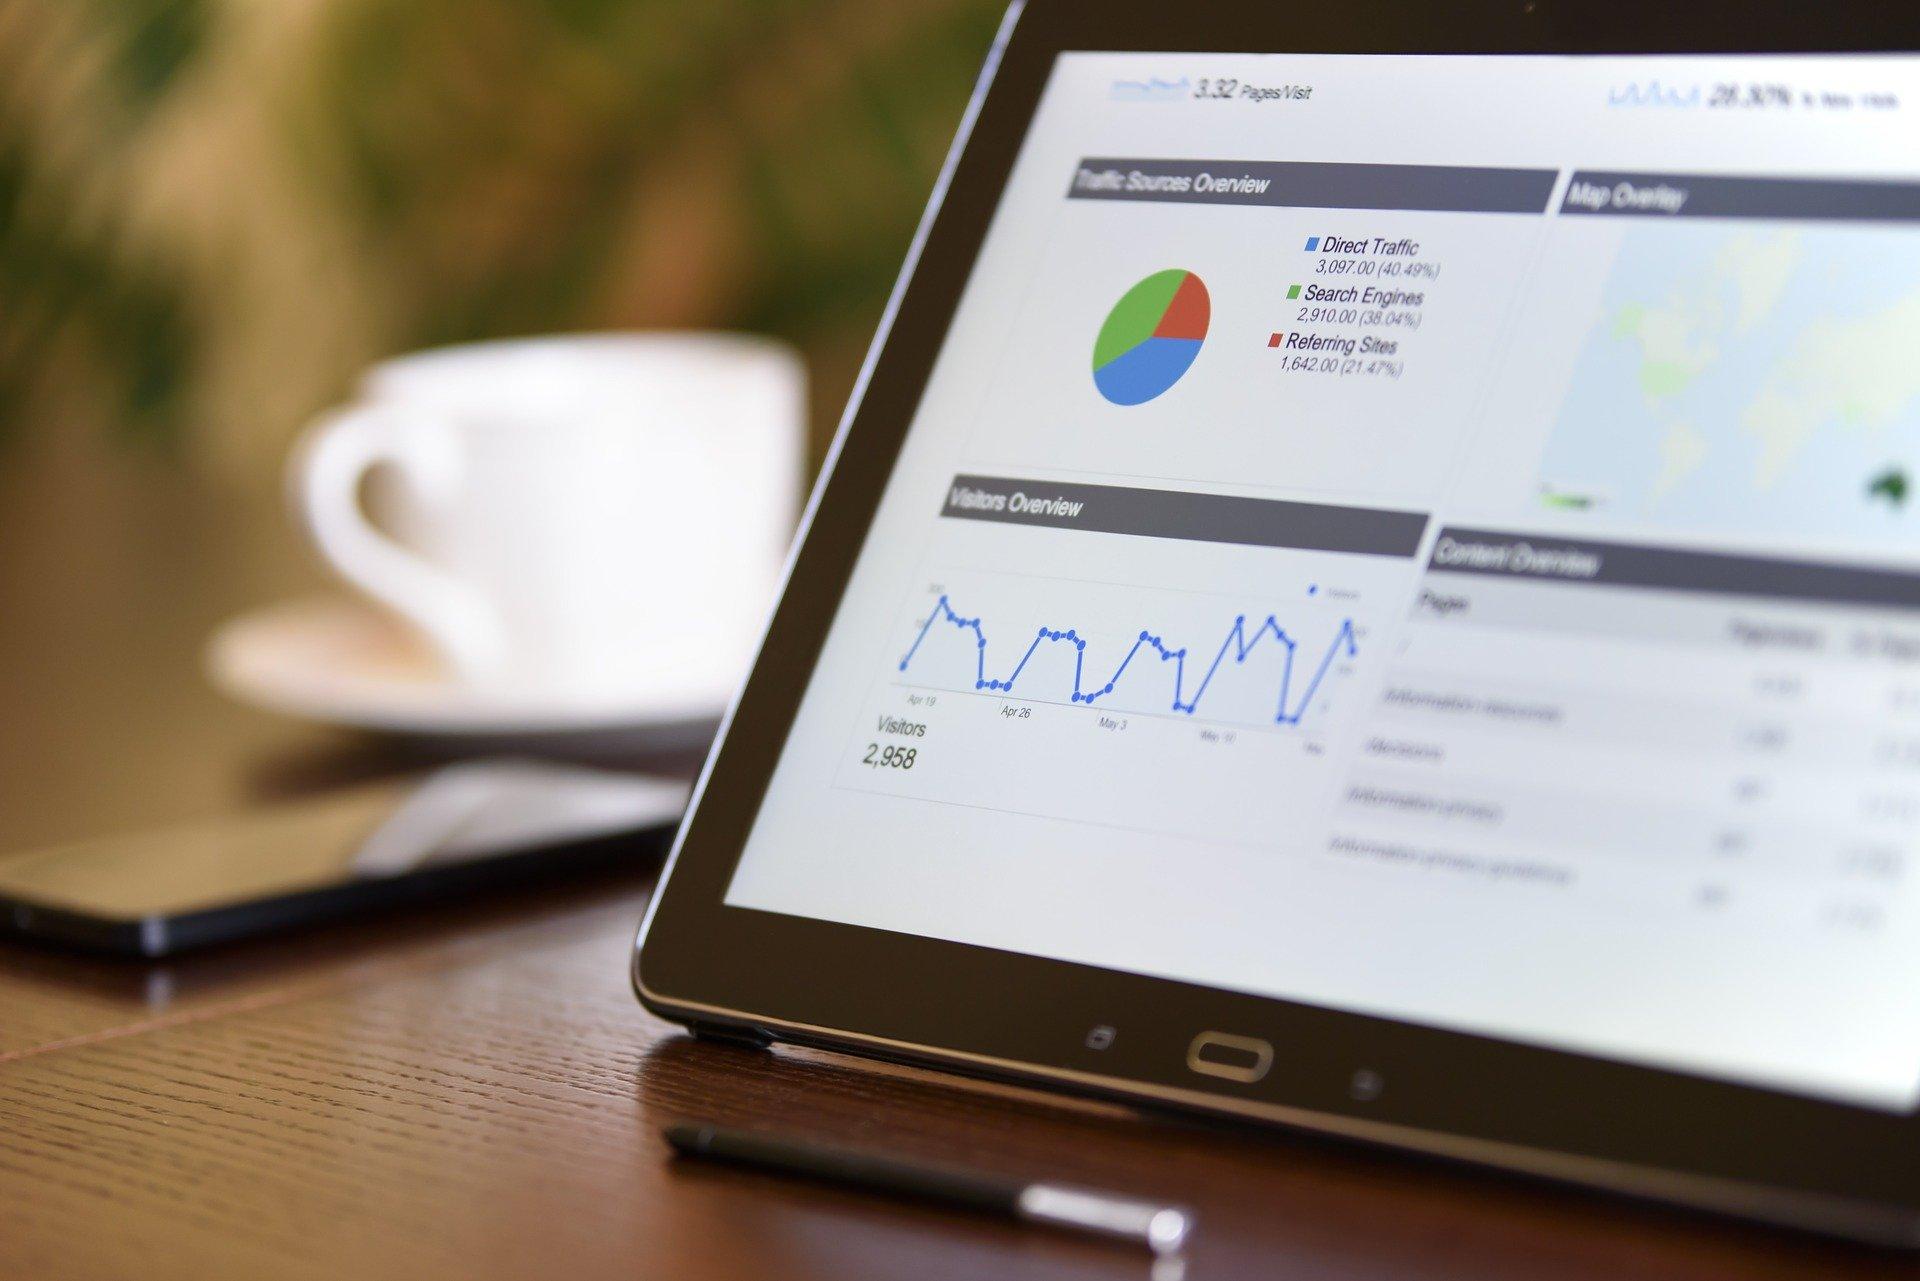 SP Digital Consultants google mapping -digital-marketing seo 2020